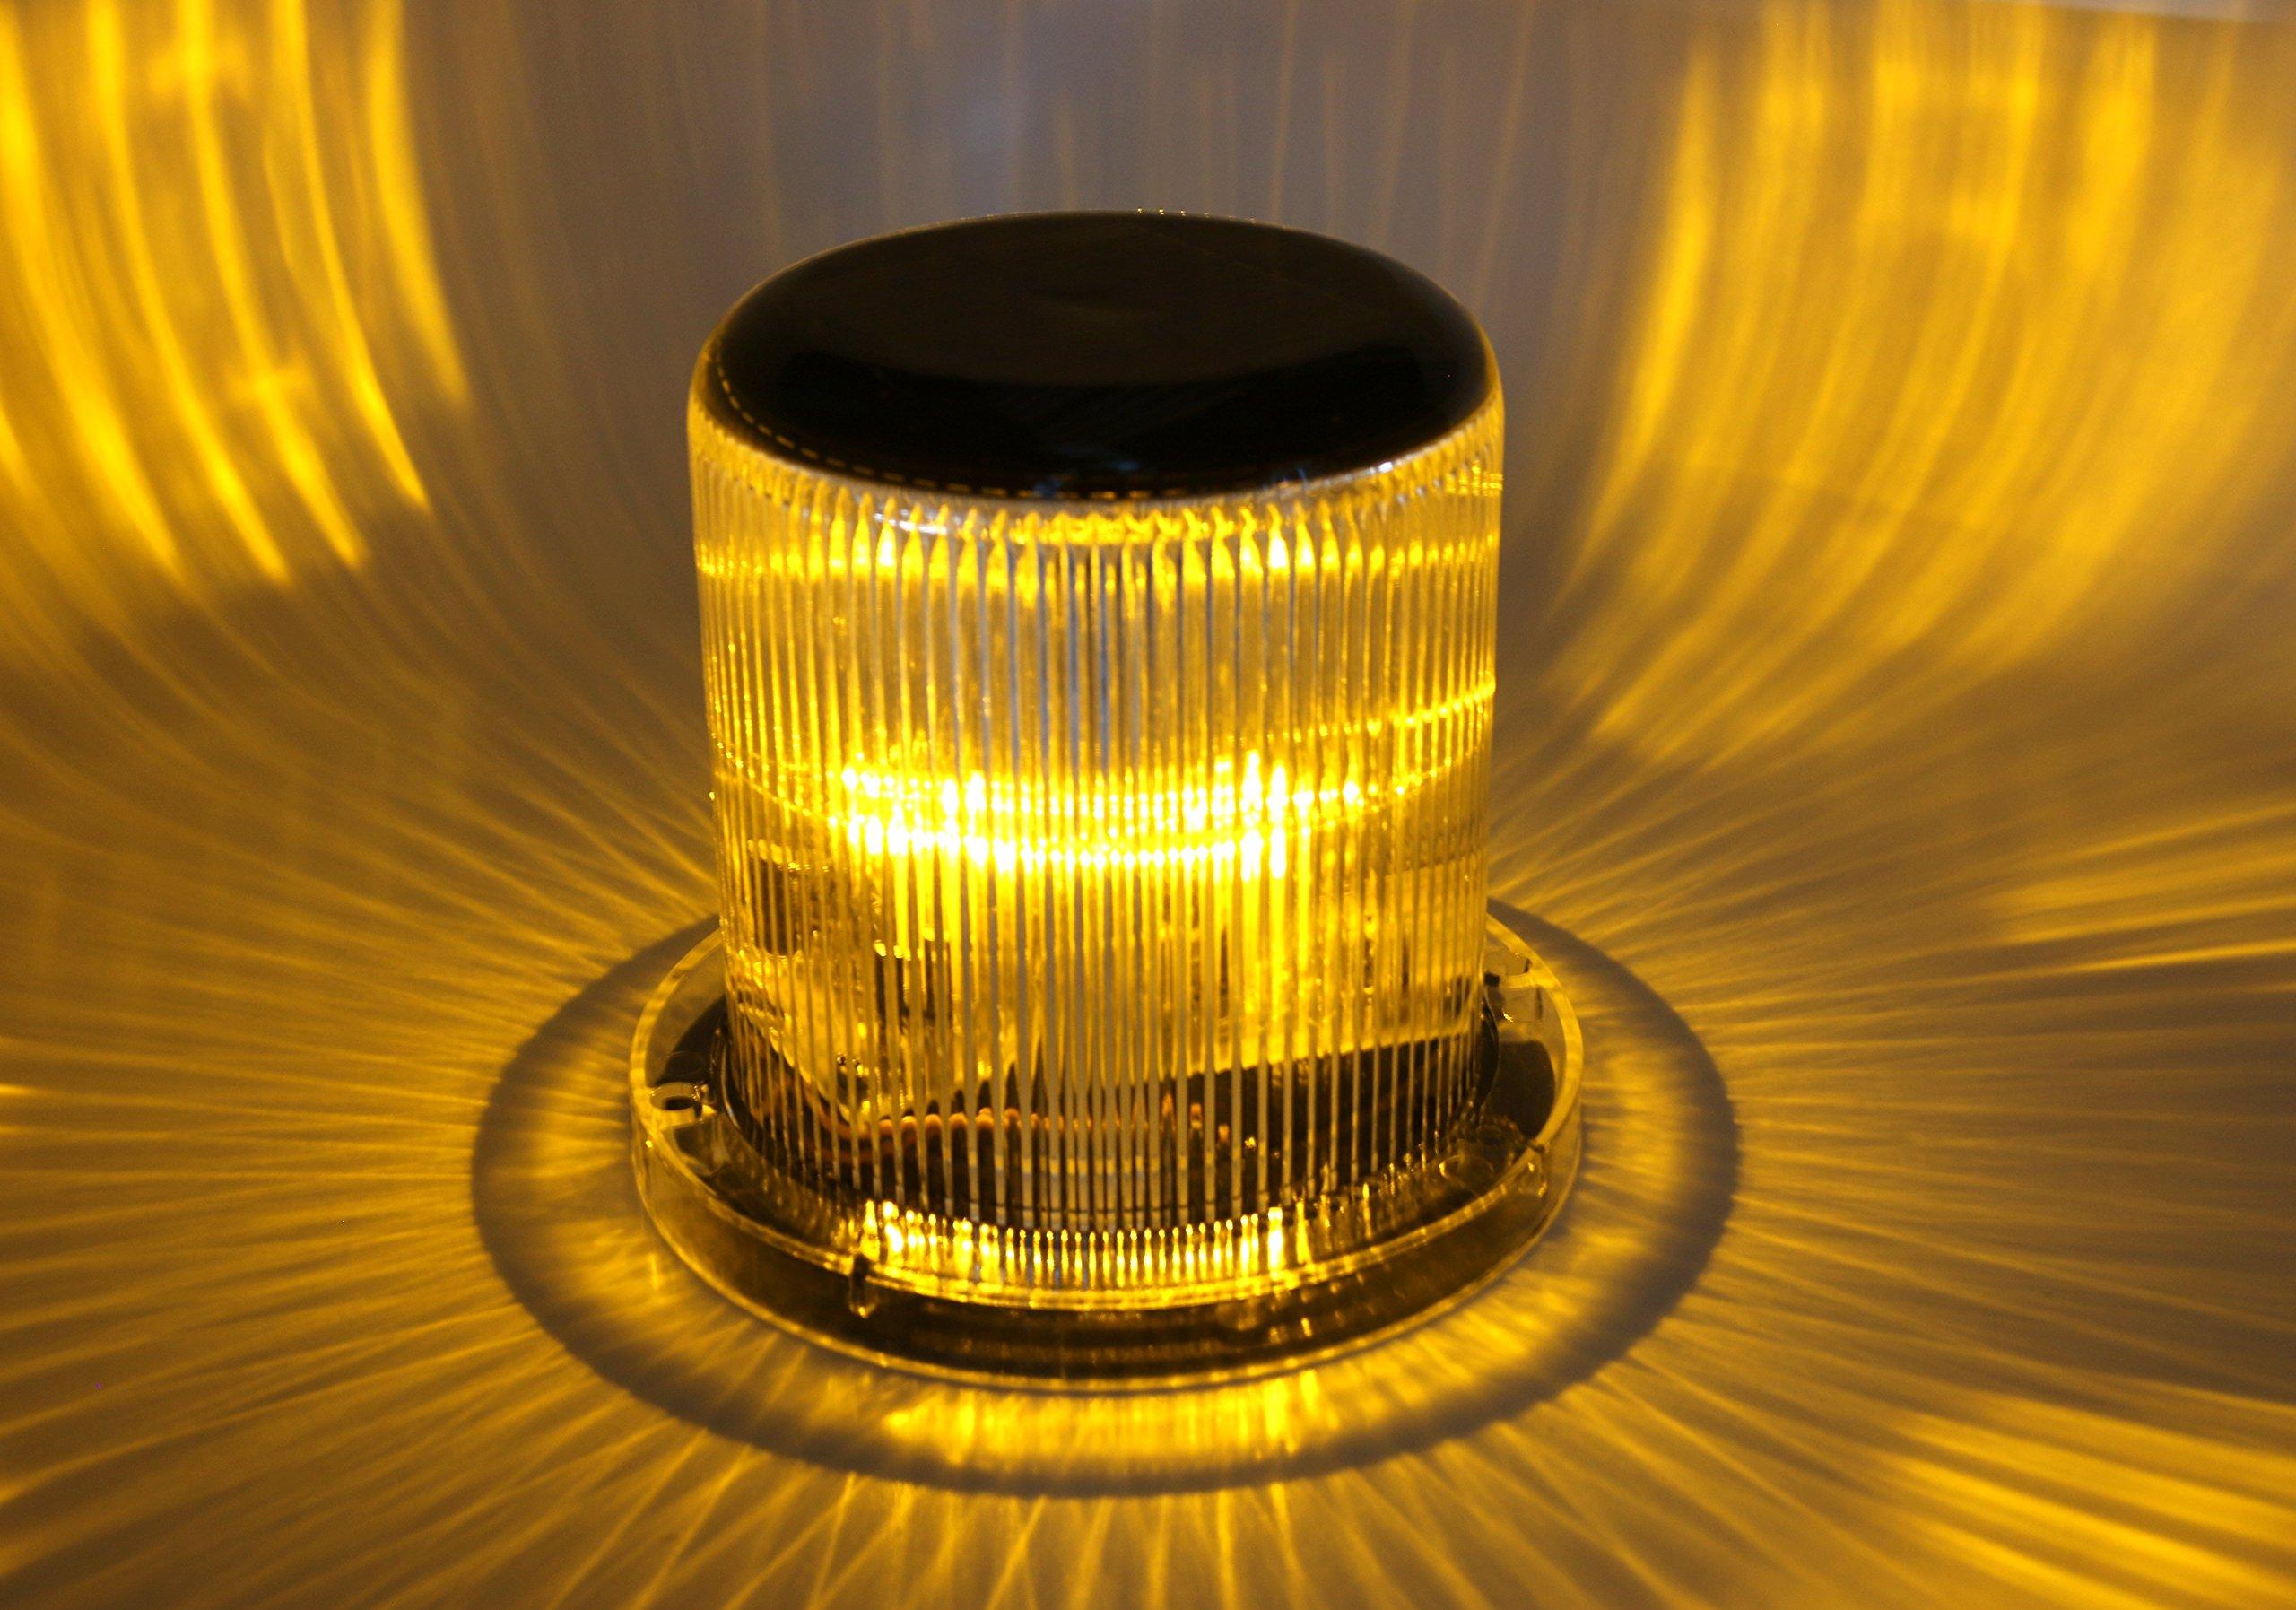 Solar Warning Light - Waterproof Solar Dock Lighting - AMBER LED - Continuous or Flashing 360 Degree Lighting